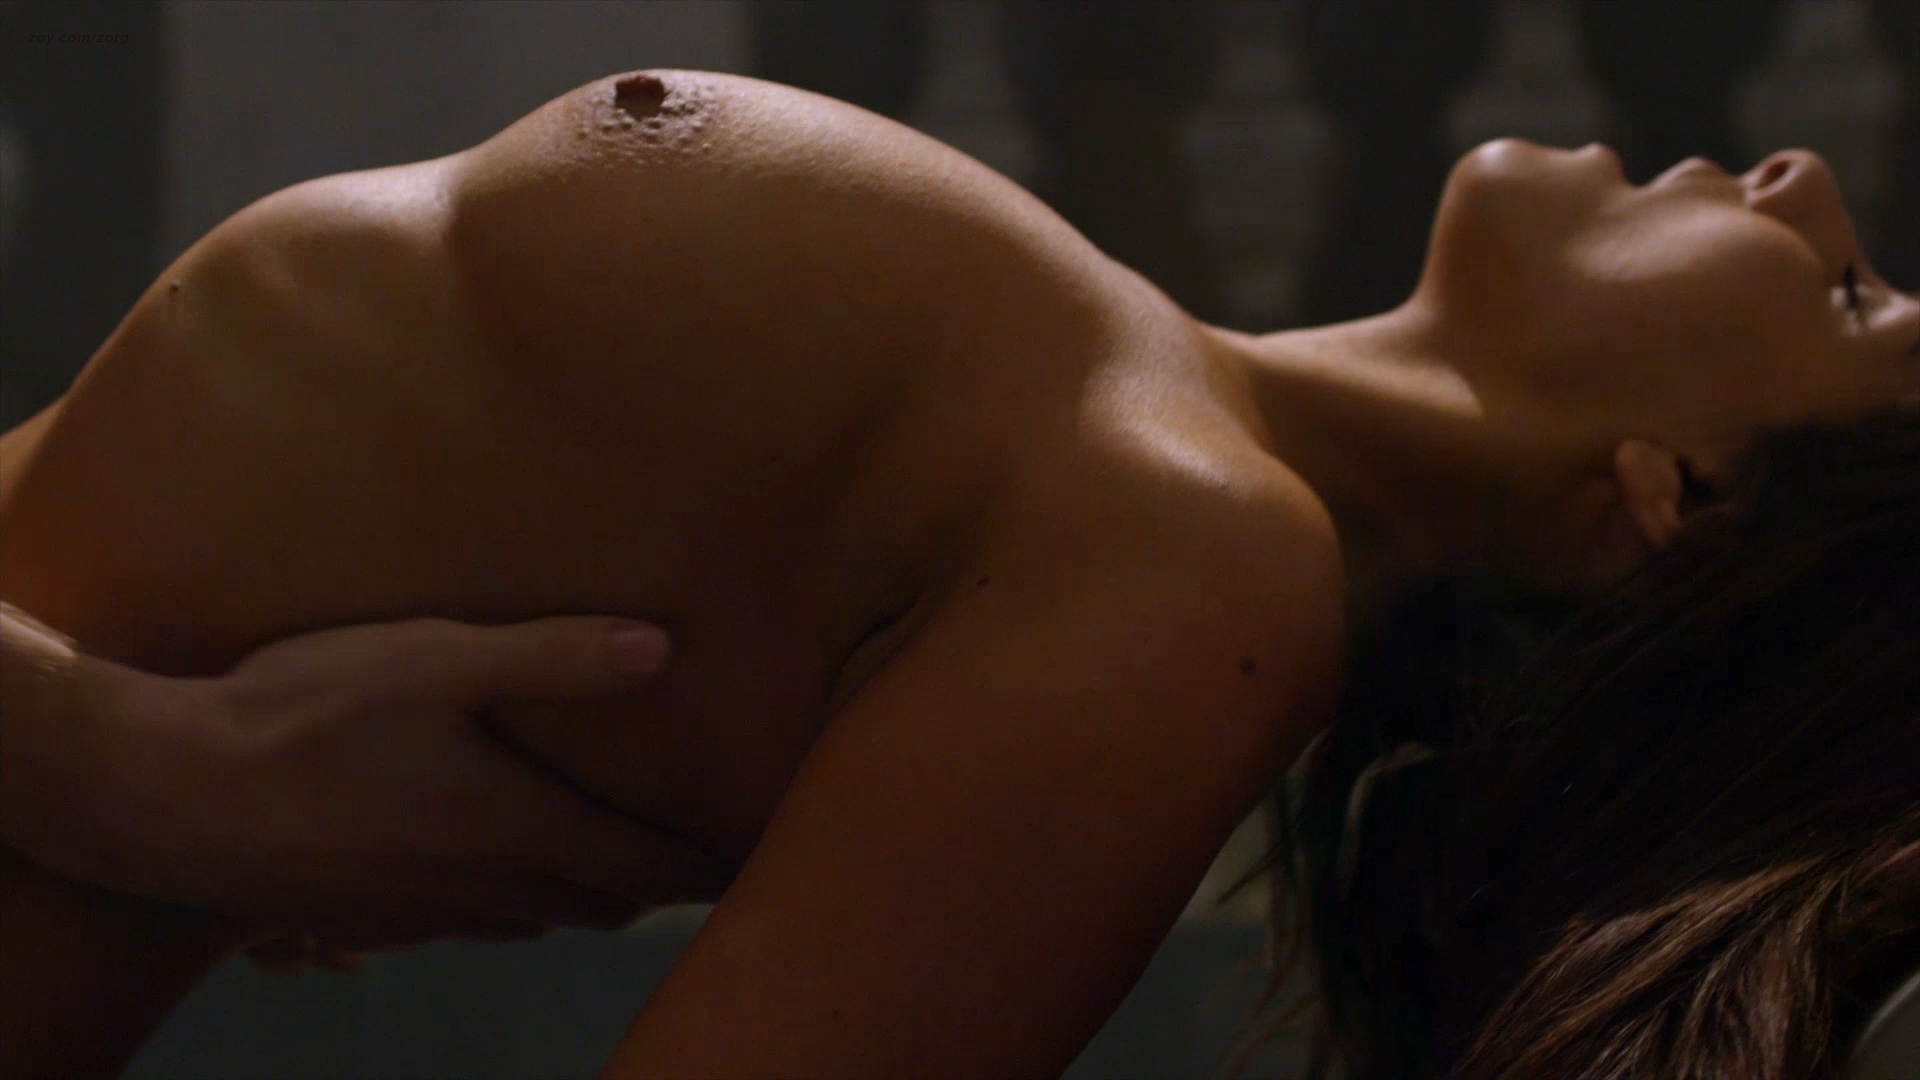 Sadie Katz nude Roxanne Pallett nude sex and others nude - Wrong Turn 6 Last_Resort (2014) hd1080p (3)